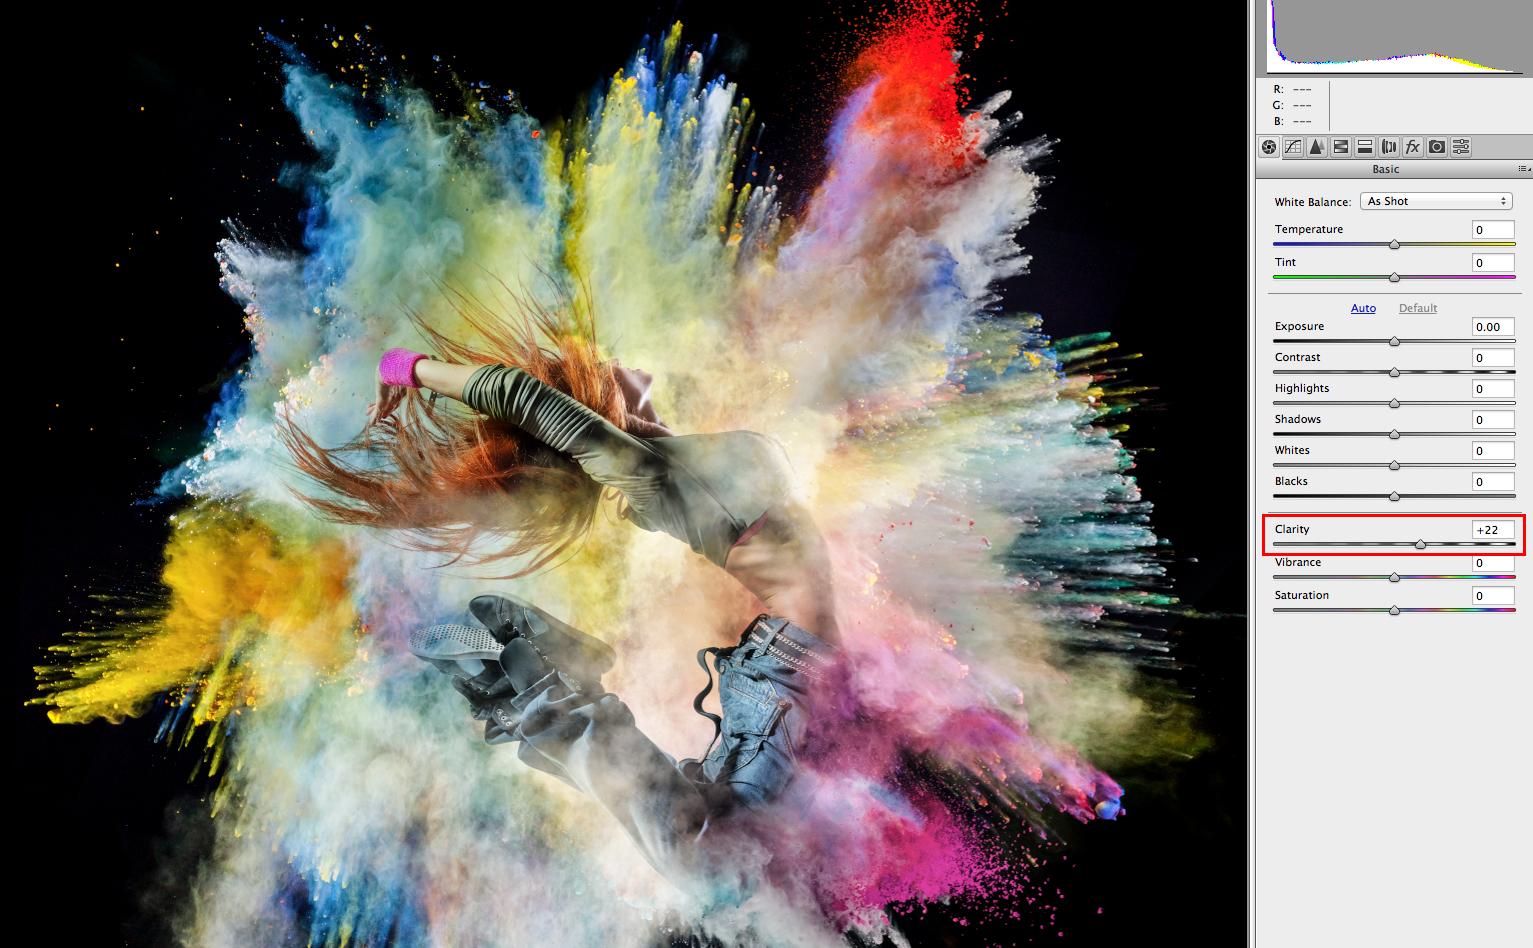 Def Leppard - Photograph Lyrics m